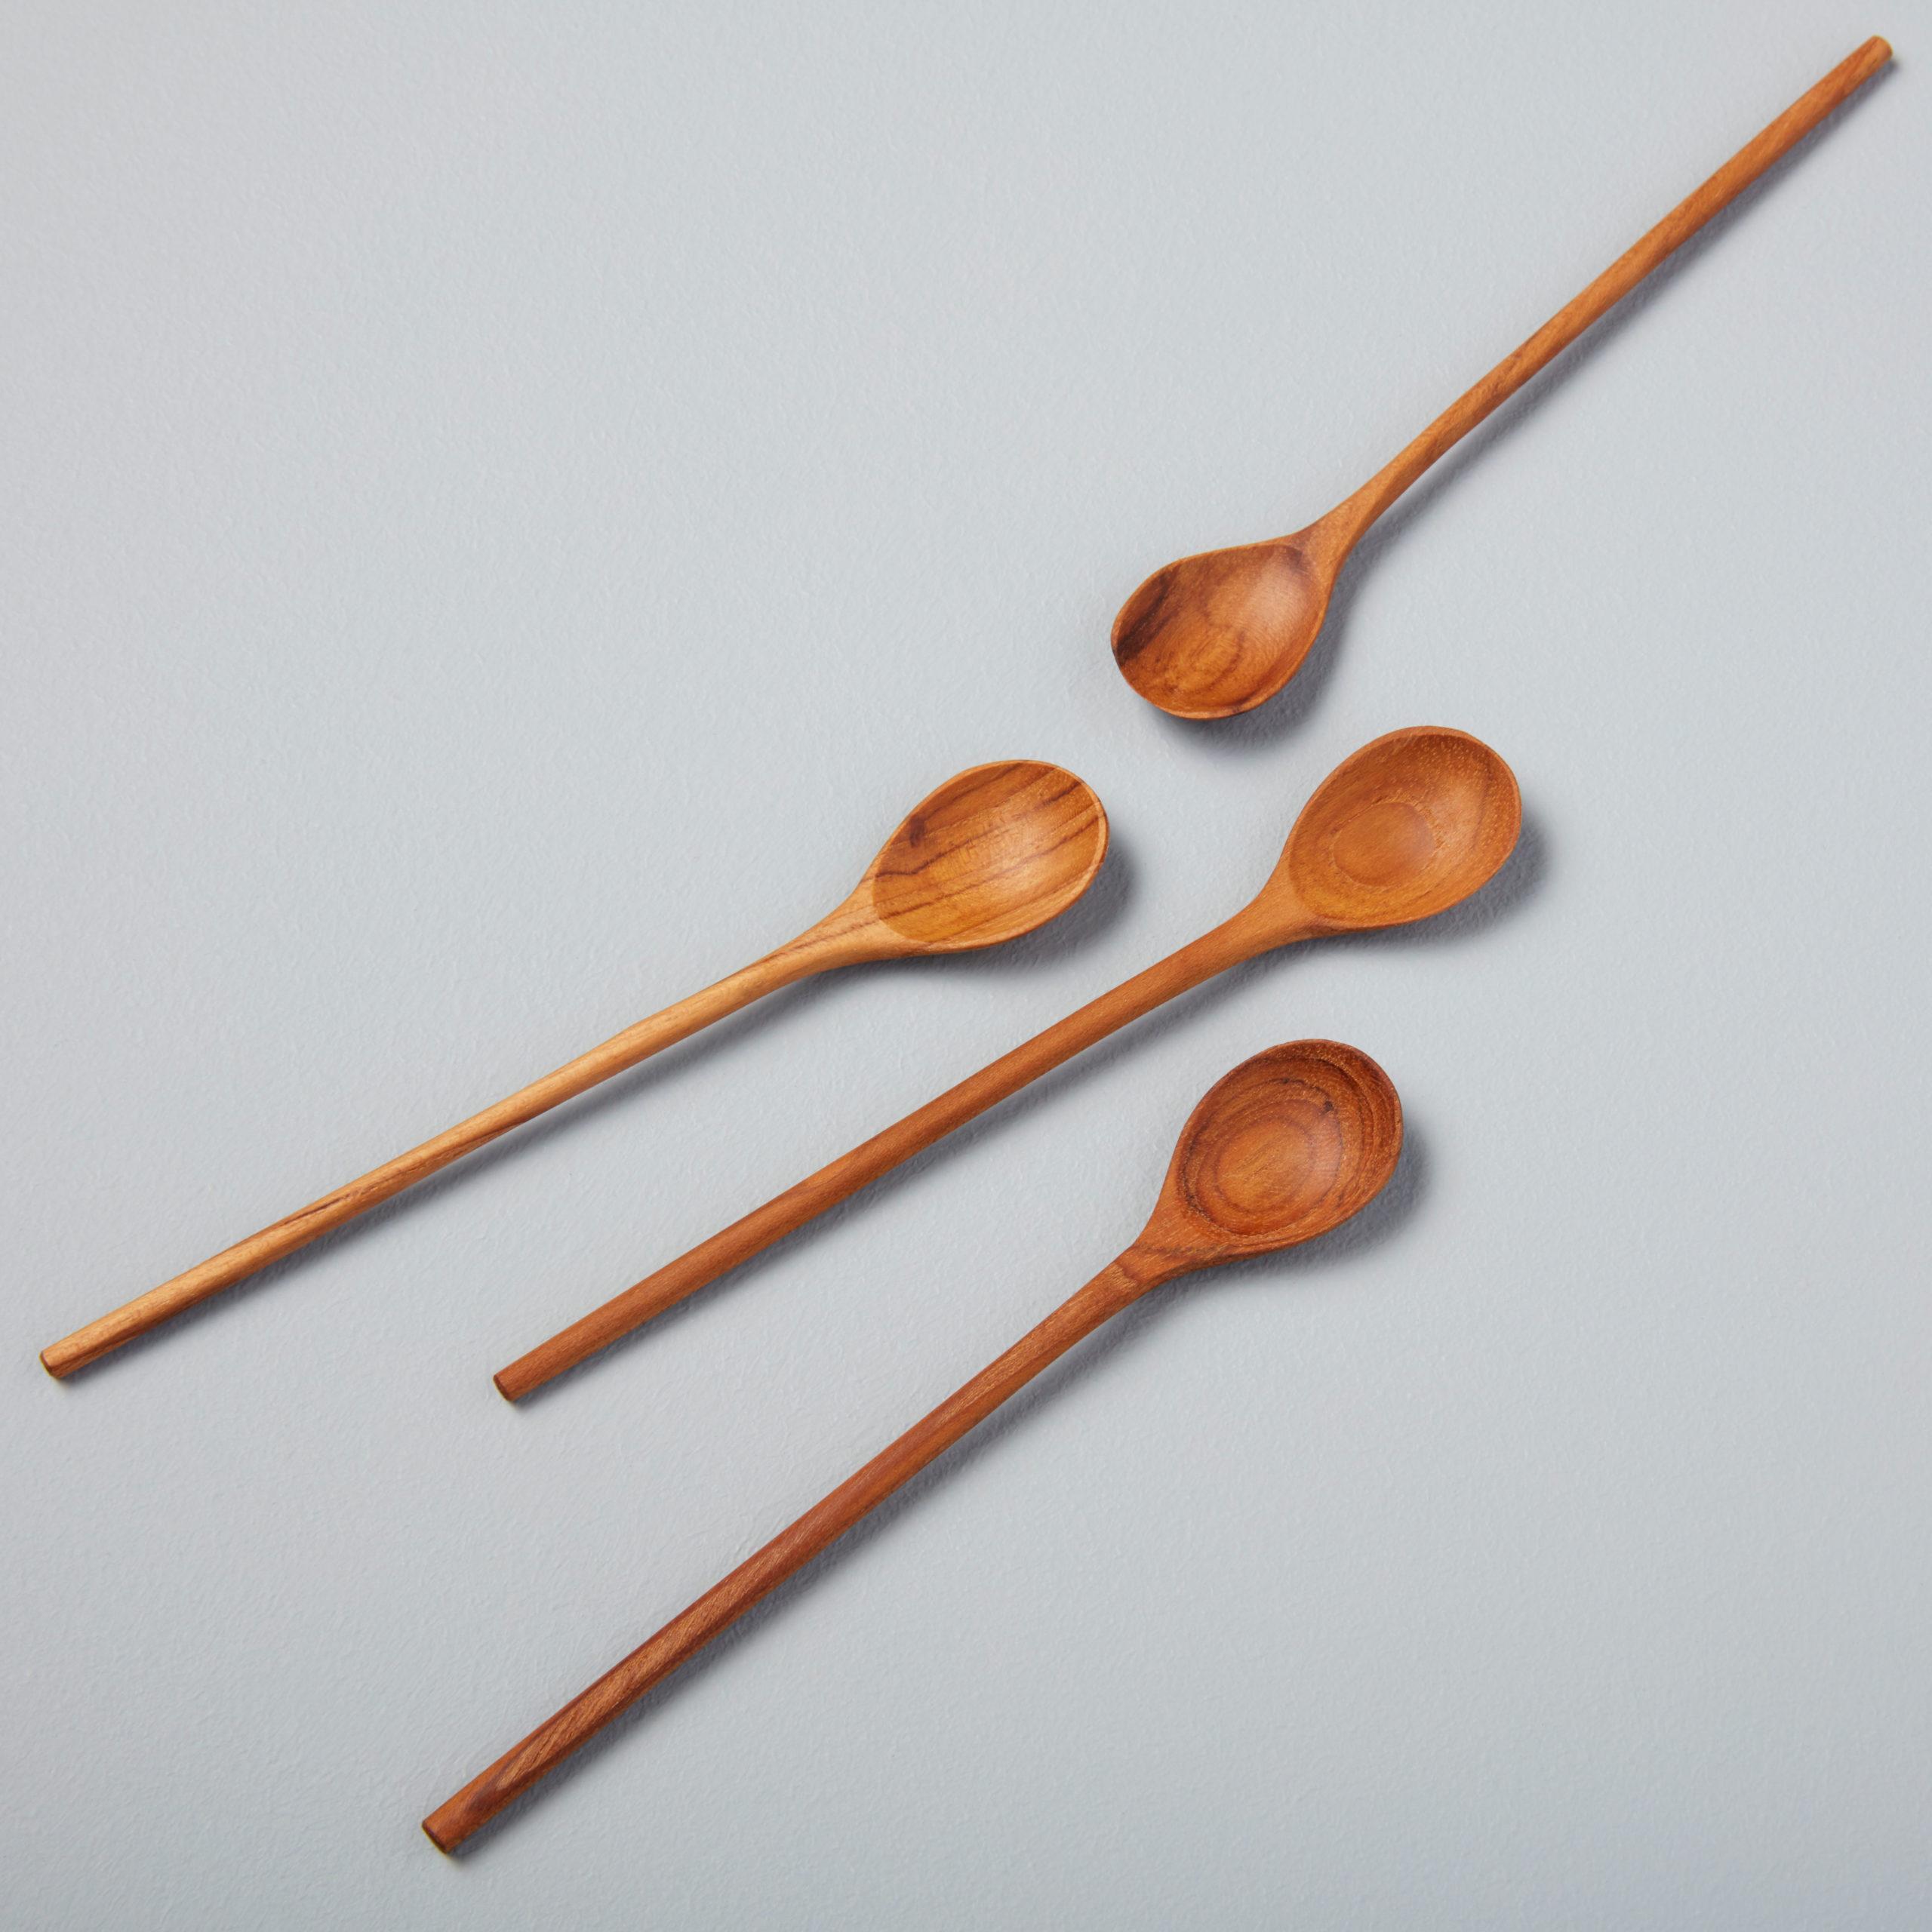 Be-Home_Teak-Thin-Spoons-Medium-Set-of-4_39-208